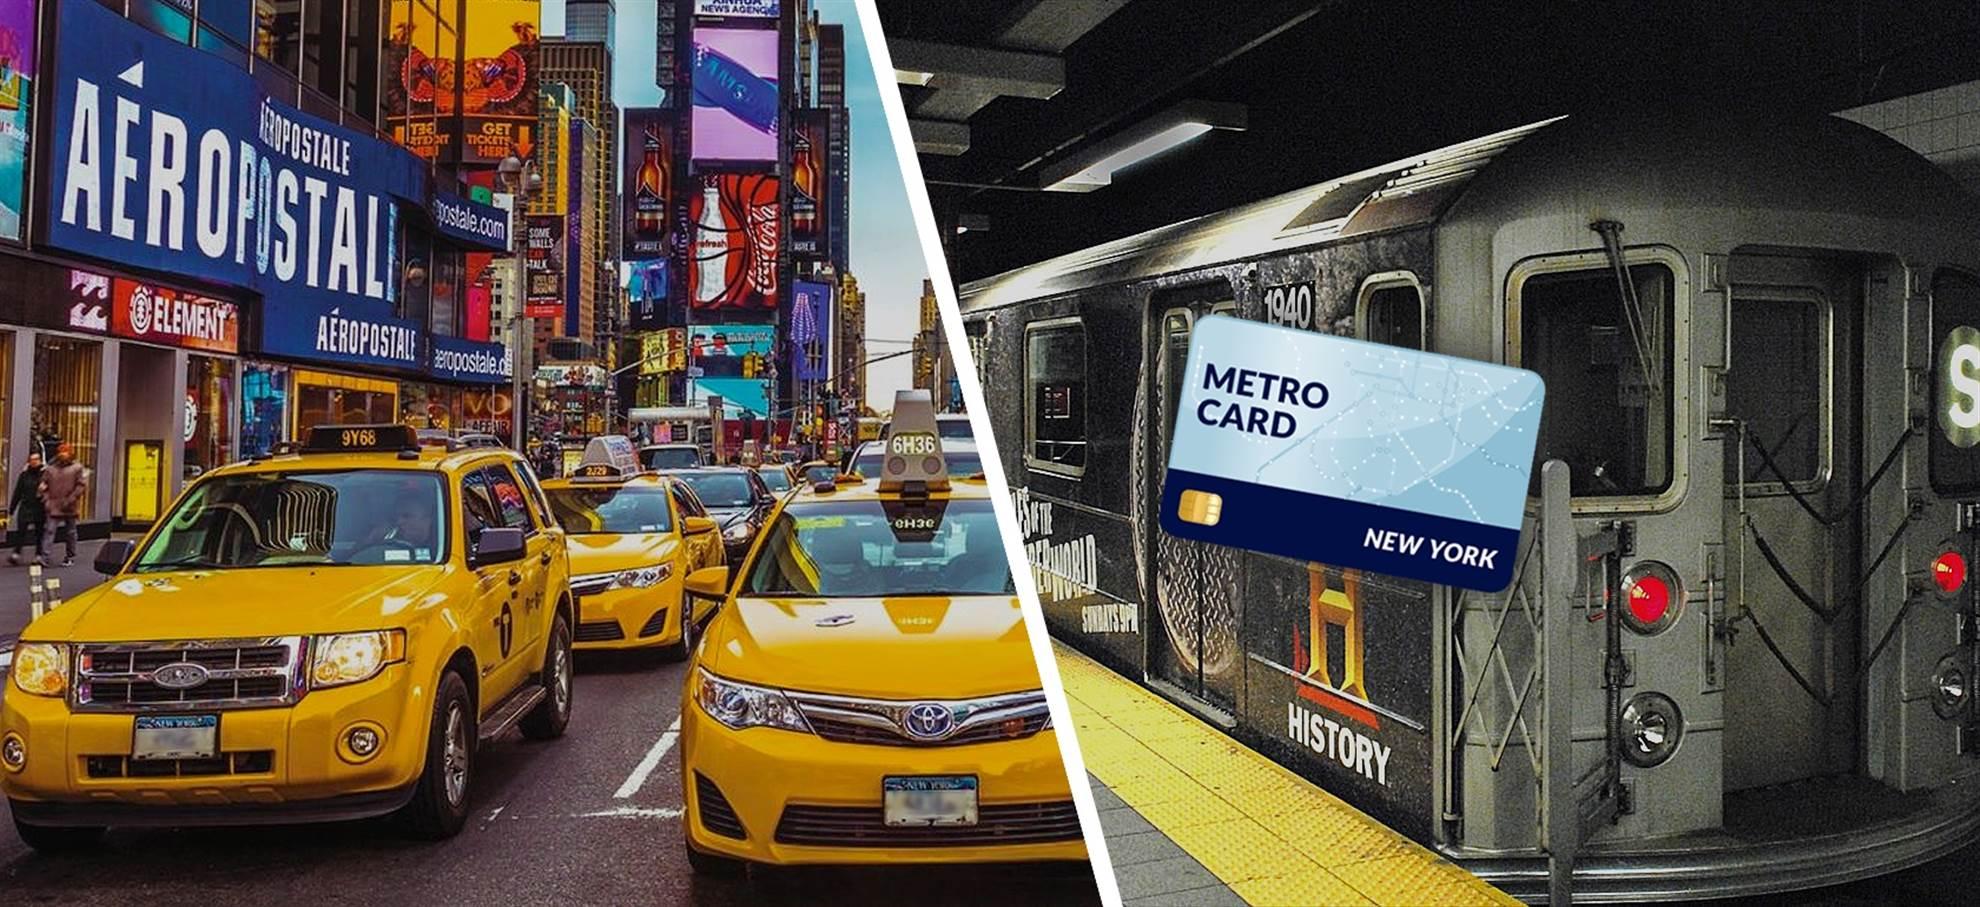 New York Metro Card (+ Private Airport Transfer)